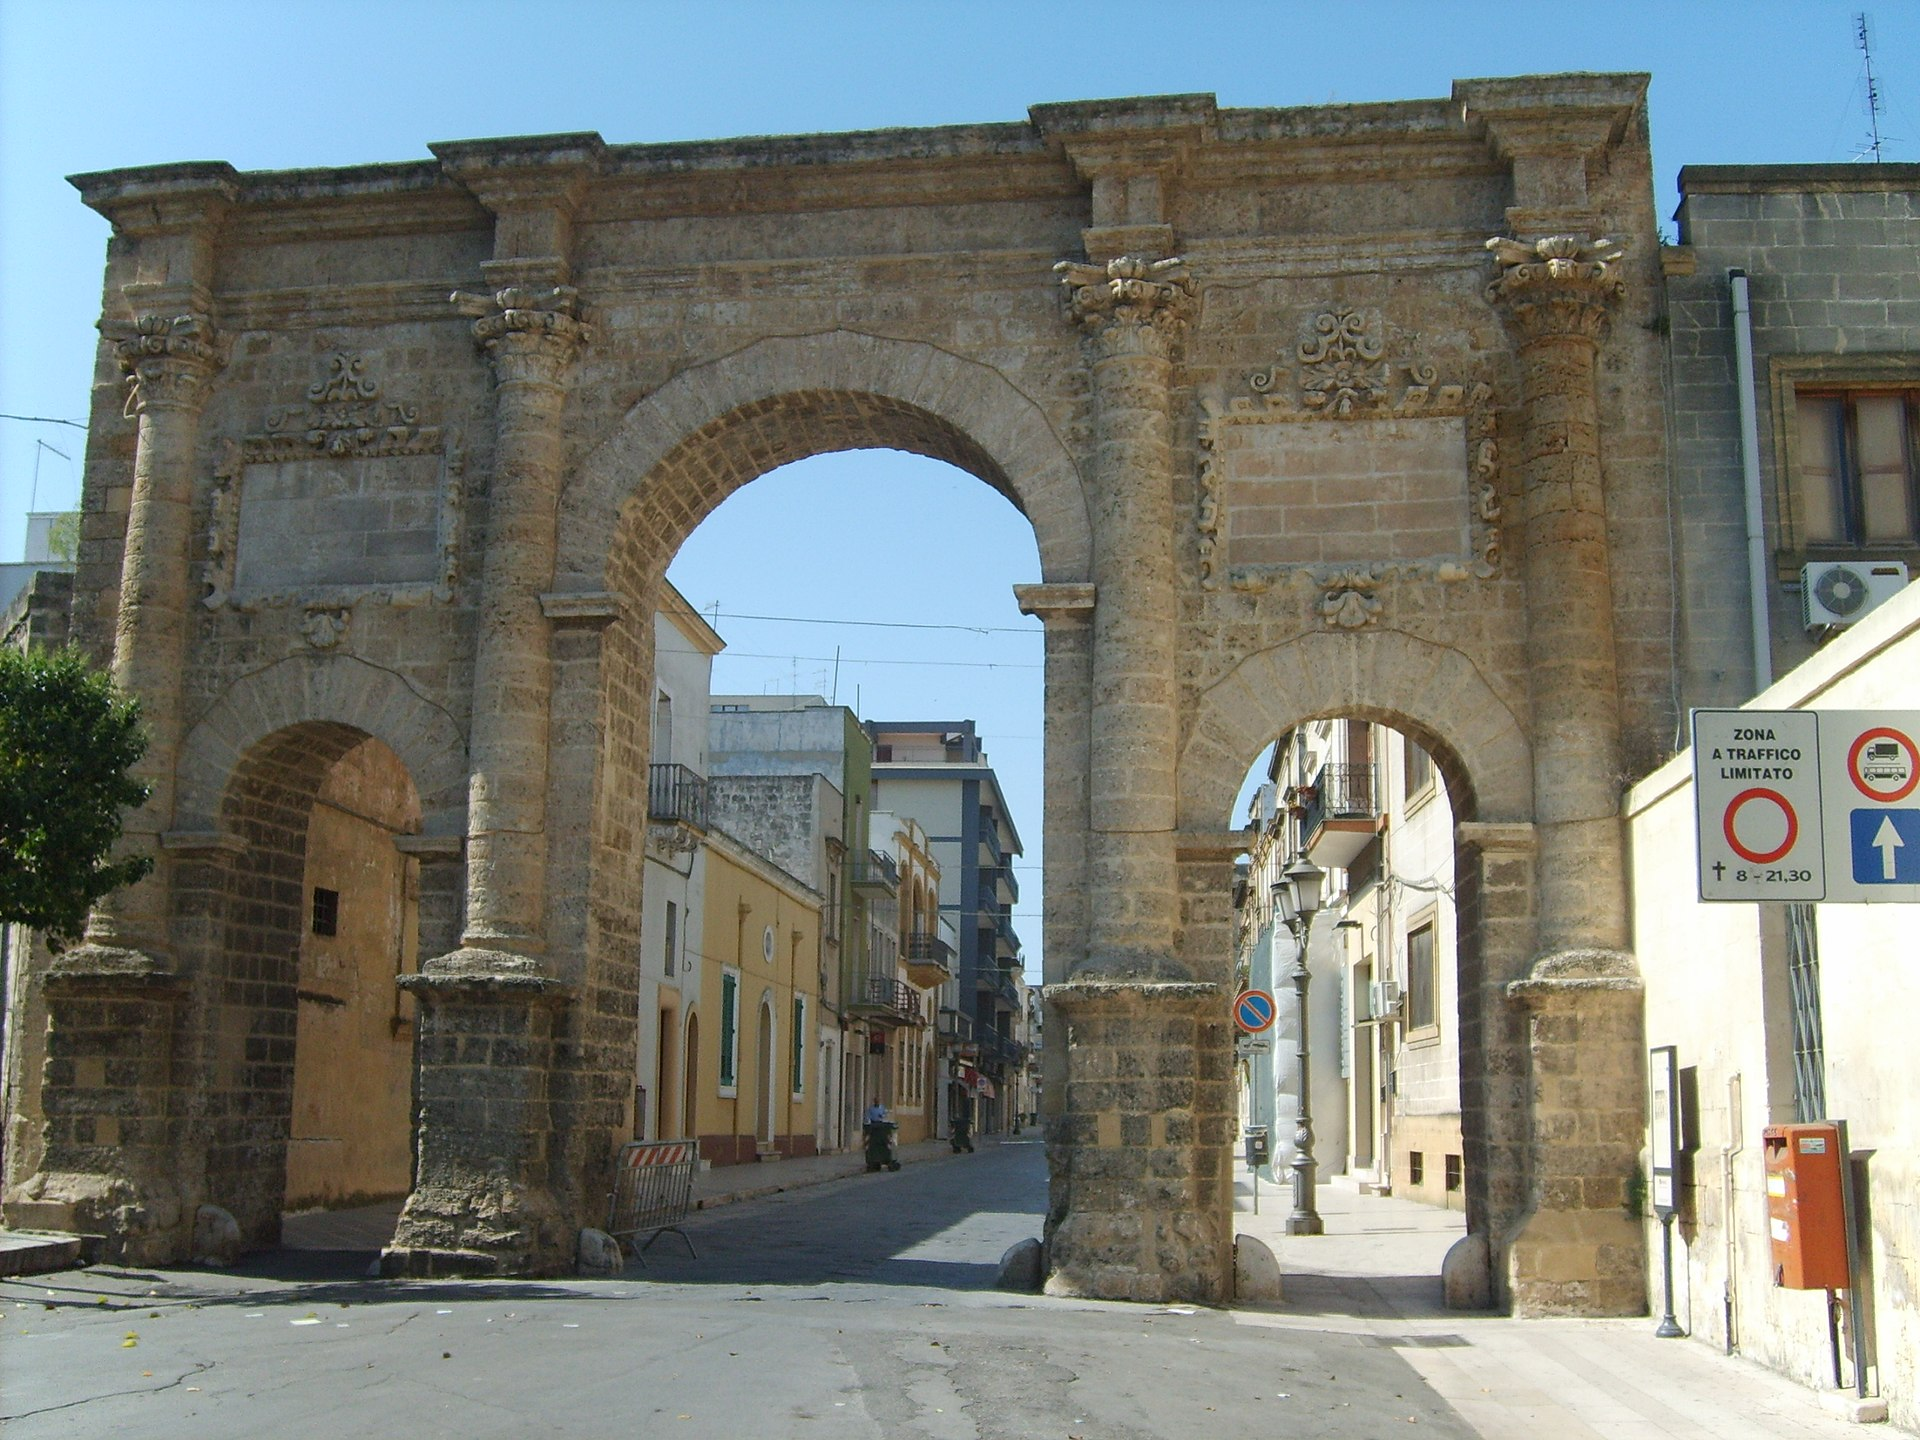 Porte di francavilla fontana wikipedia - Mobilifici francavilla fontana ...